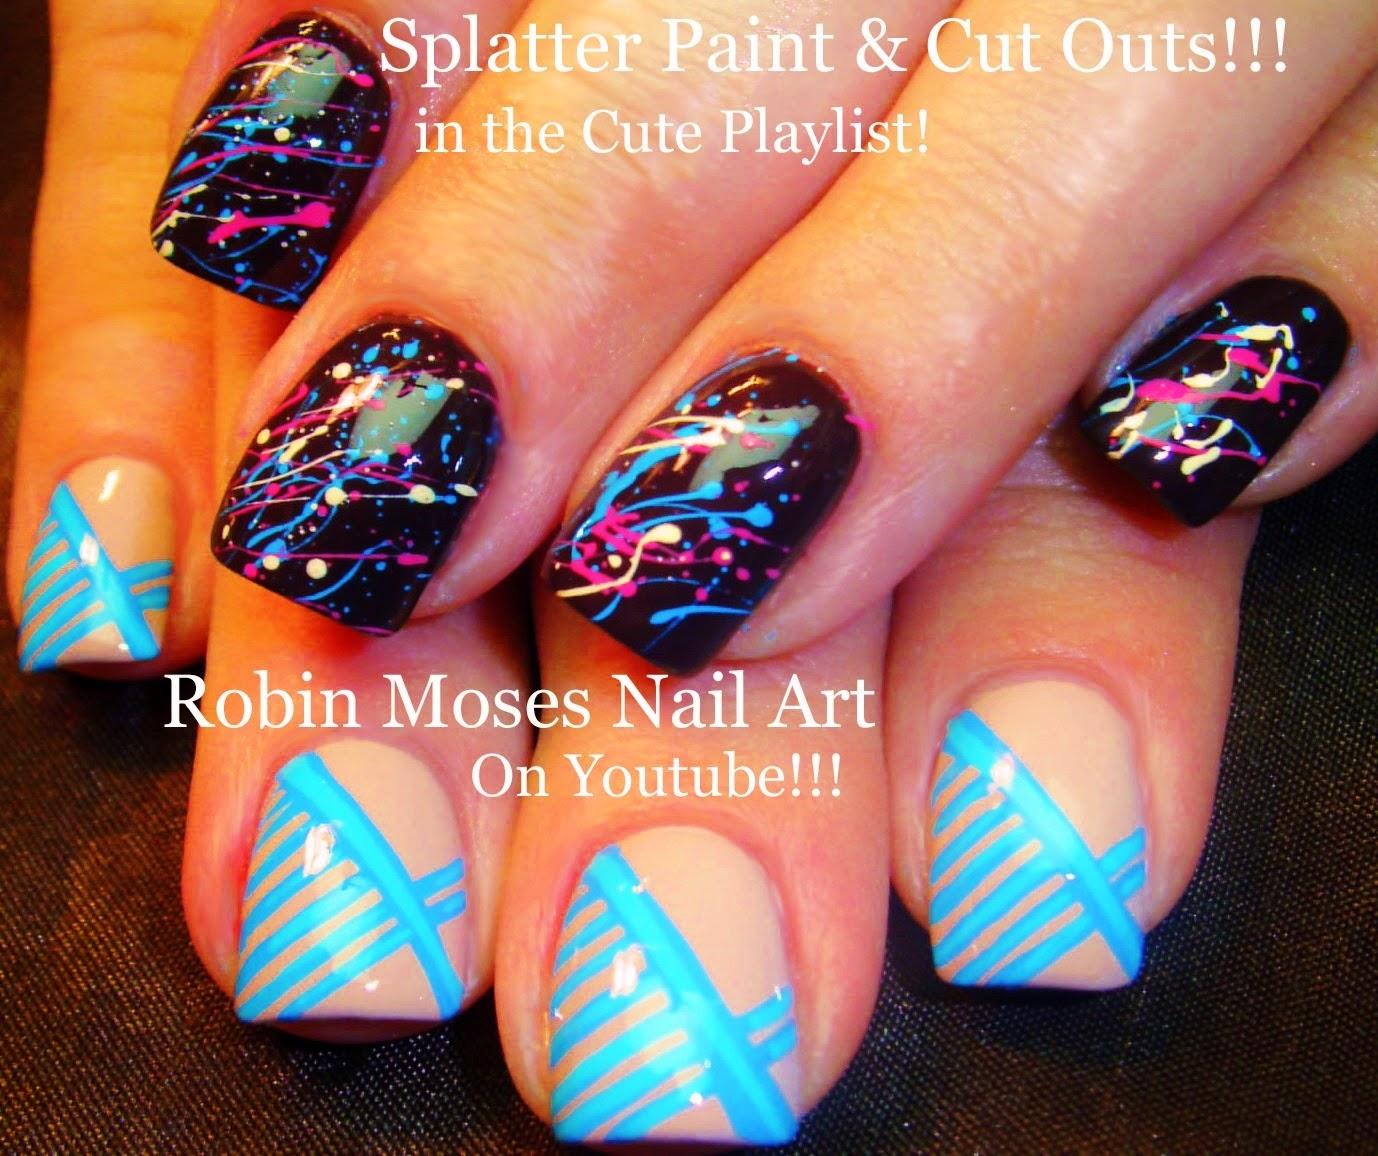 Robin Moses Nail Art: Splatter Paint Nail Art Technique